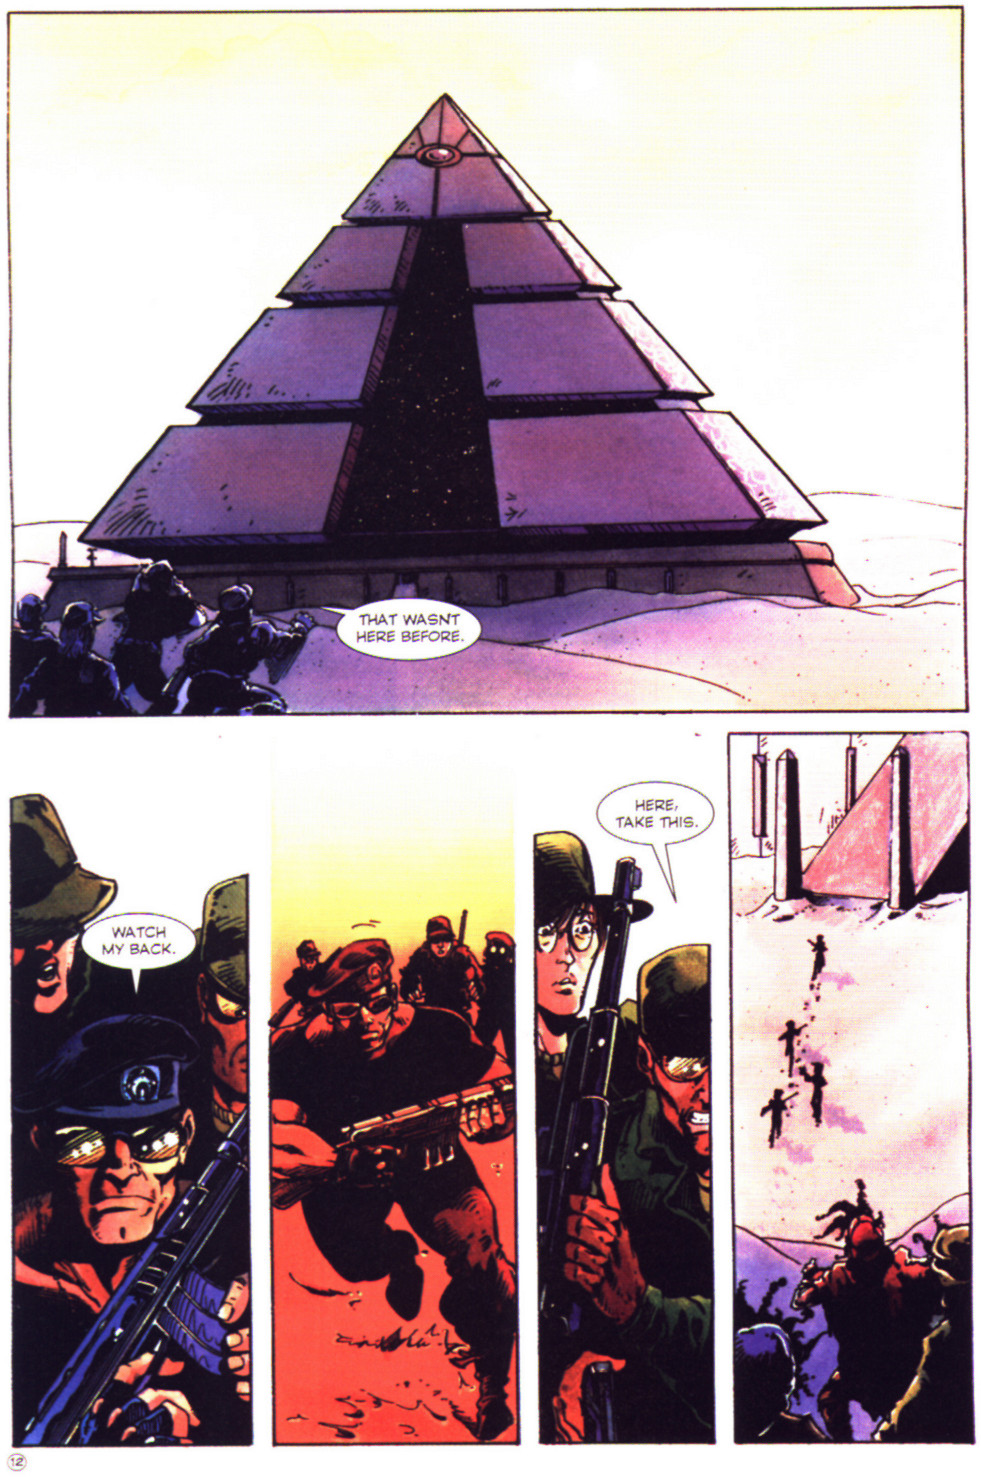 Read online Stargate comic -  Issue #2 - 14